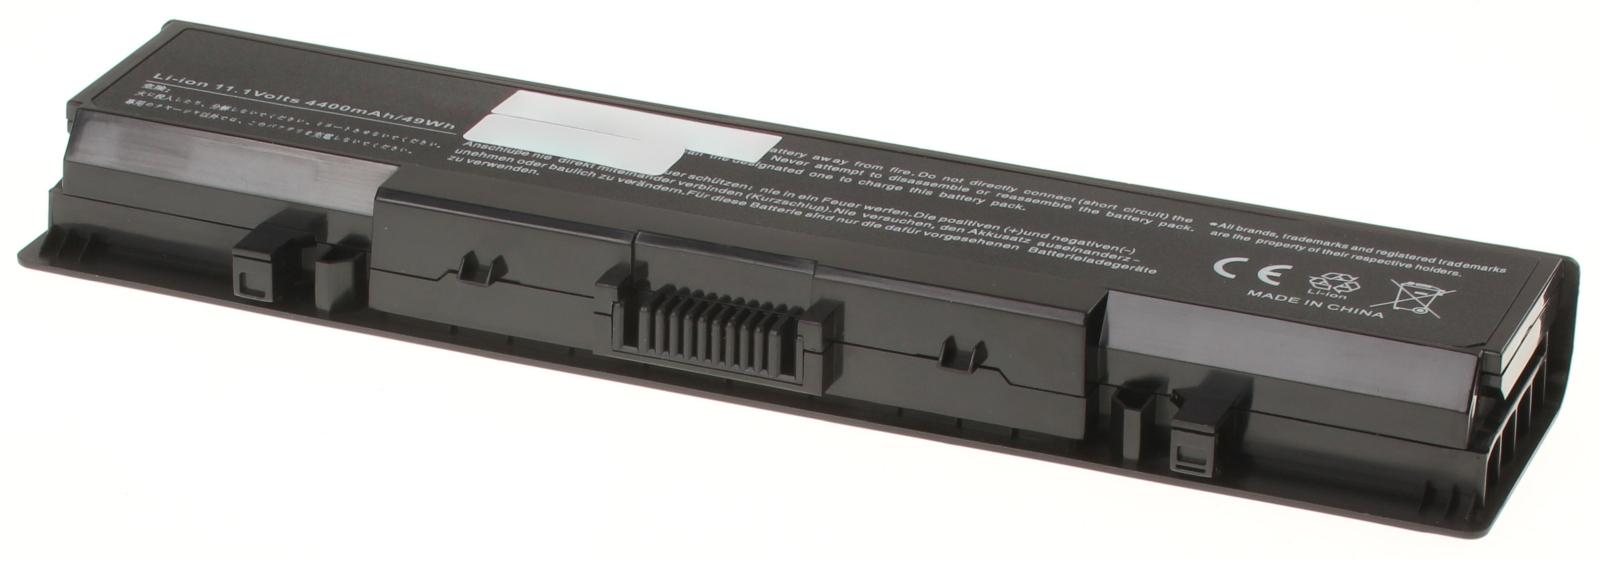 Аккумуляторная батарея для ноутбука Dell Vostro 1700. Артикул 11-1218.Емкость (mAh): 4400. Напряжение (V): 11,1